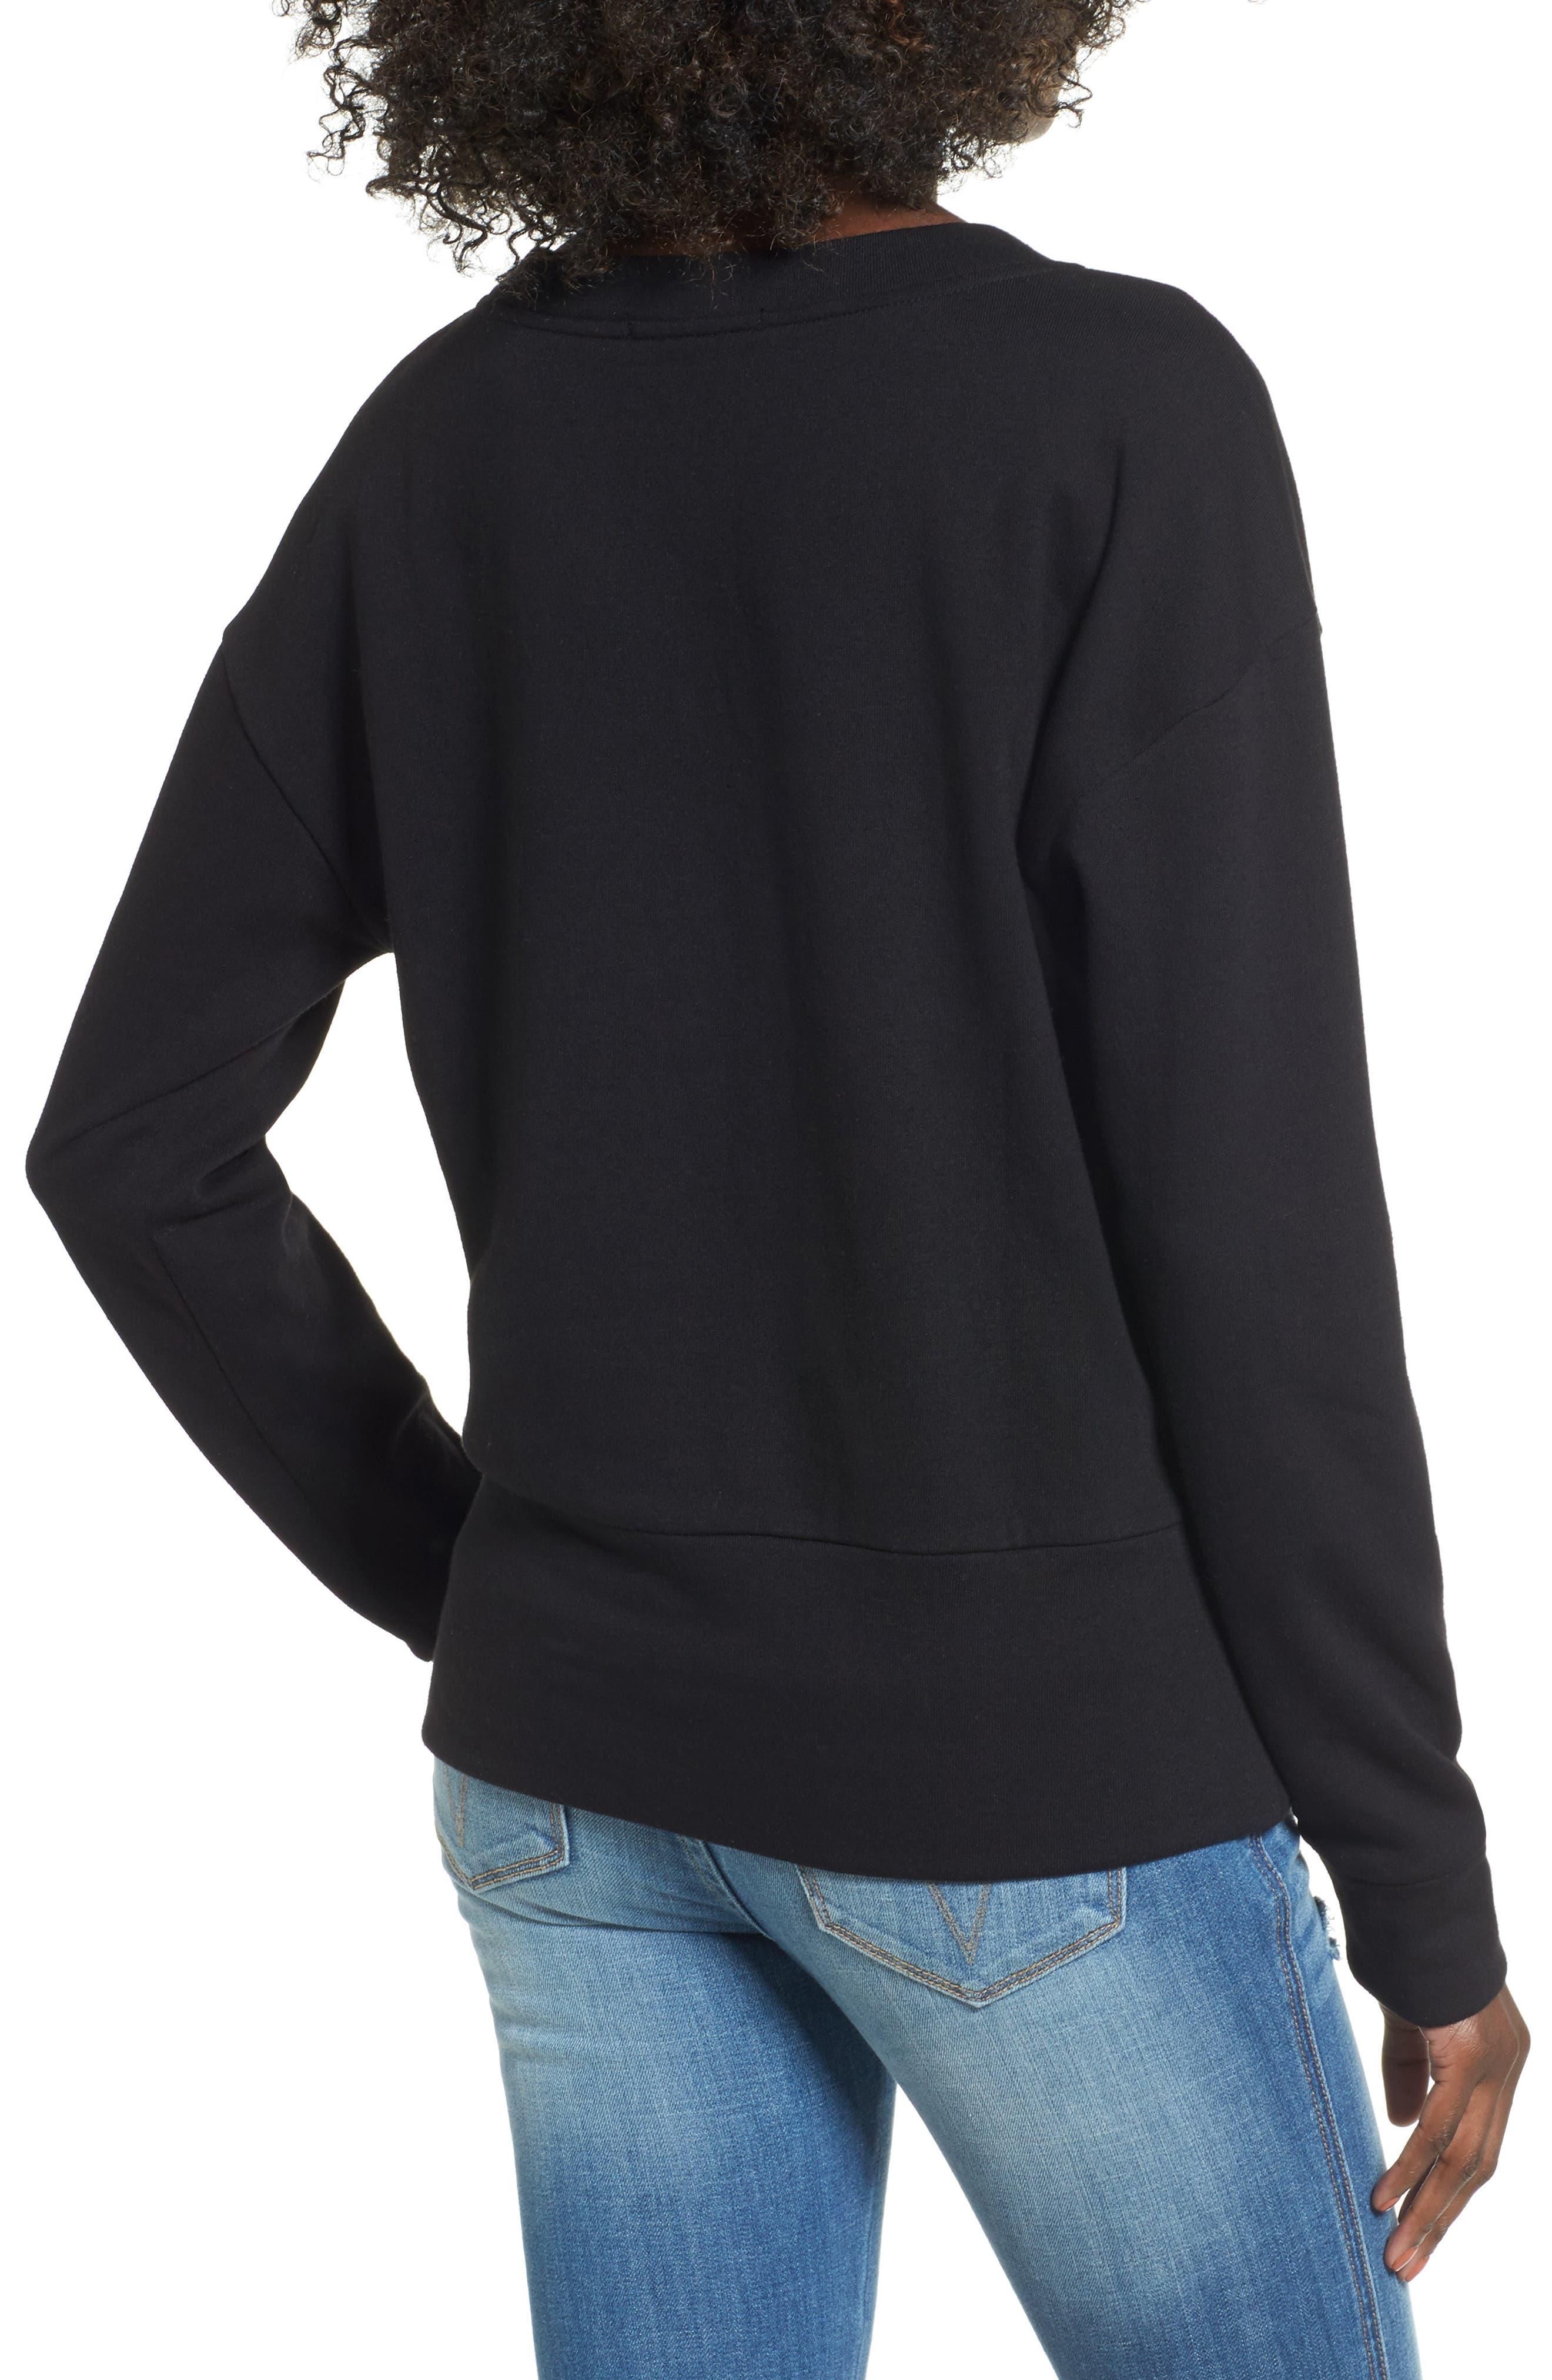 Alternate Image 2  - Socialite Lace-Up Sweatshirt